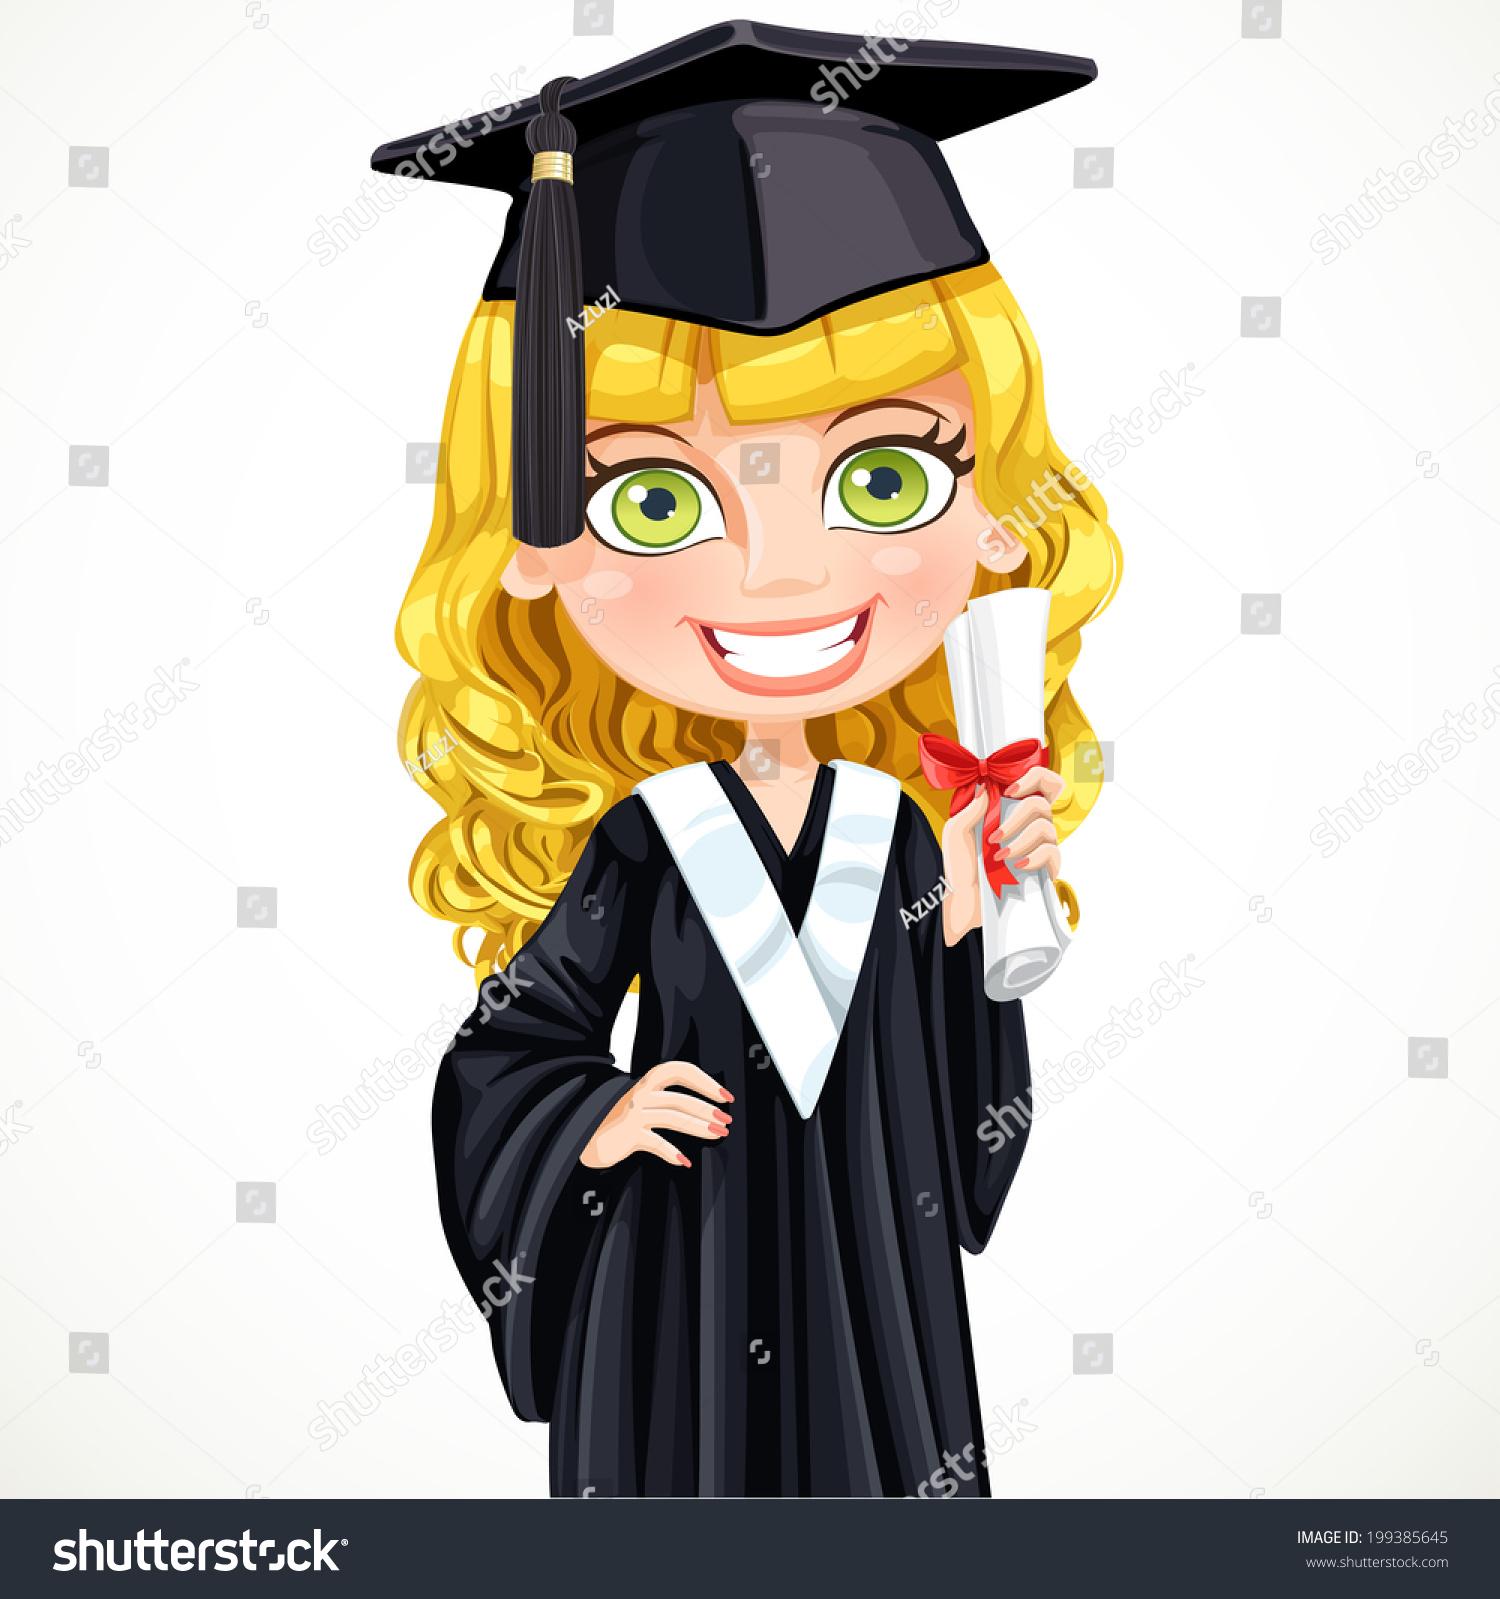 Happy girl in black graduation gown | EZ Canvas